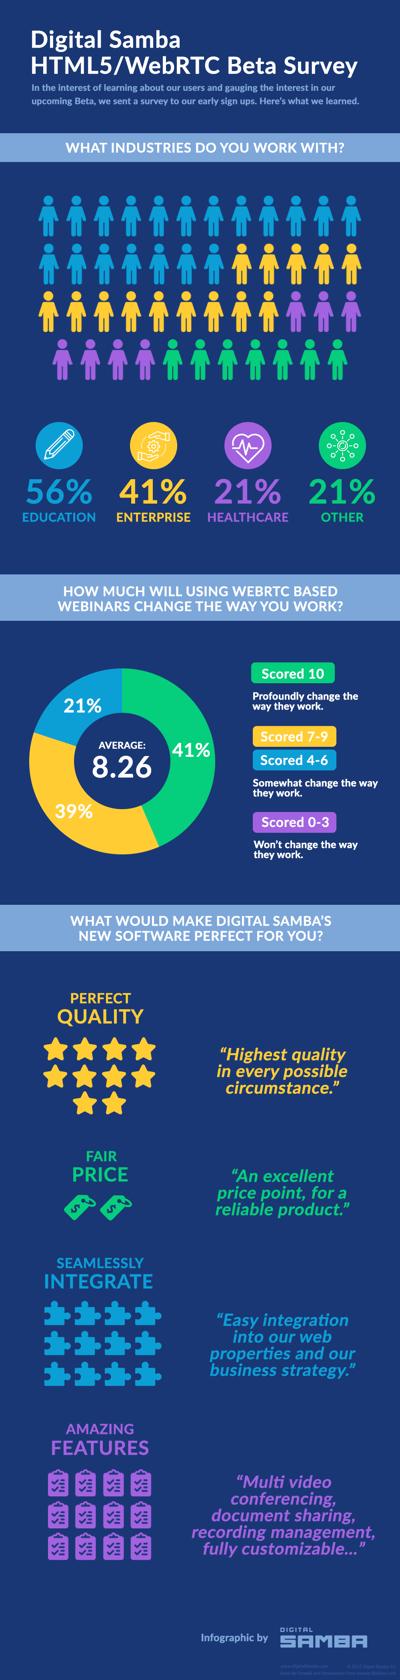 Full Beta Survey Infographic for sharing